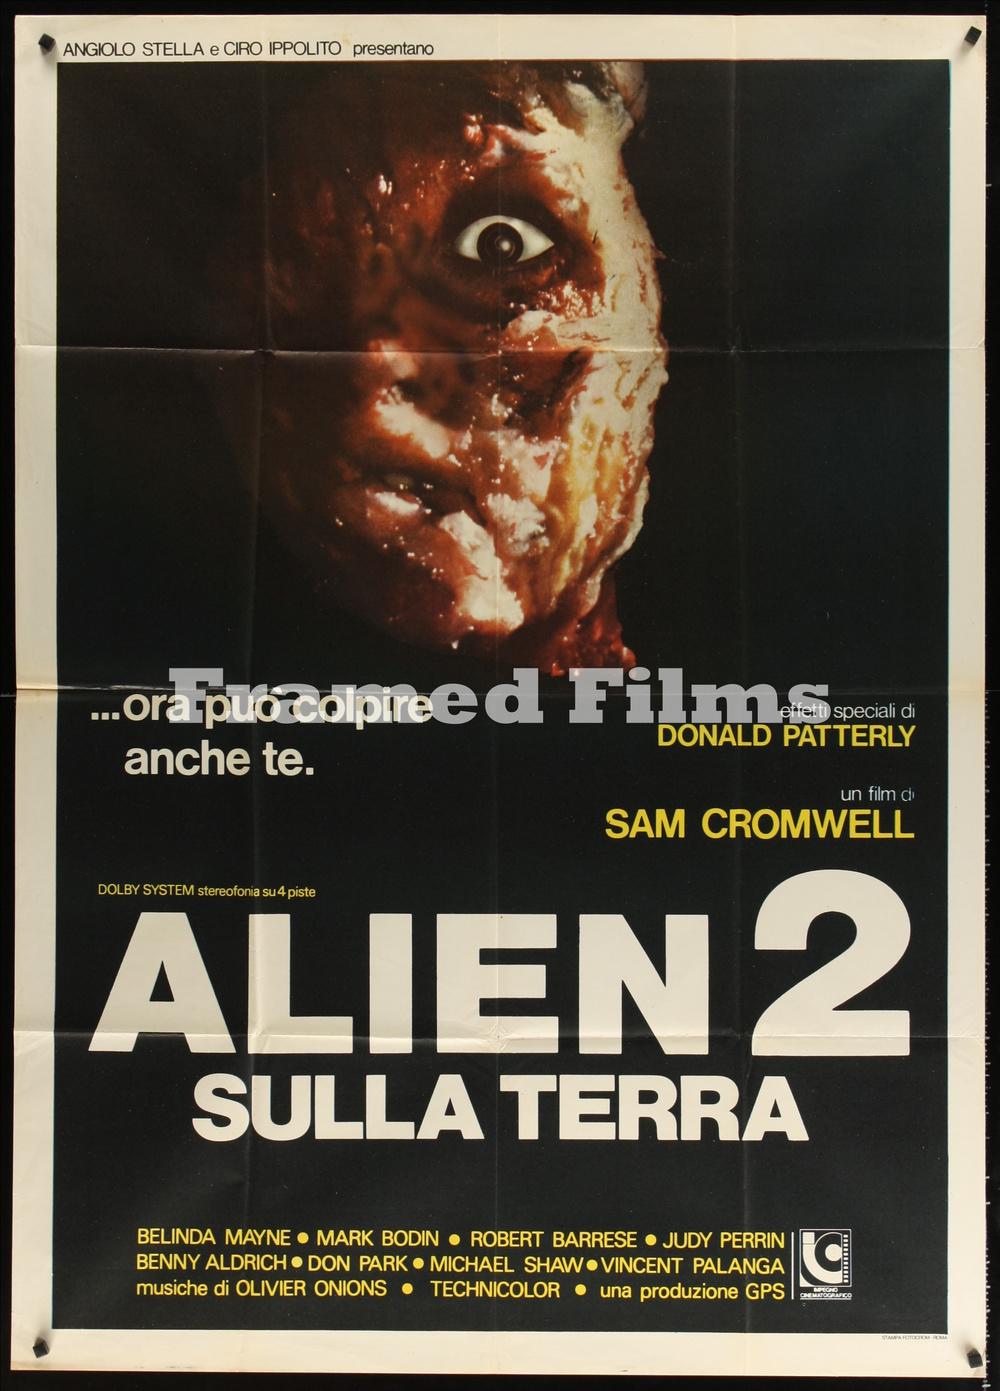 italian_1p_alien_2_JC07243_L.jpg